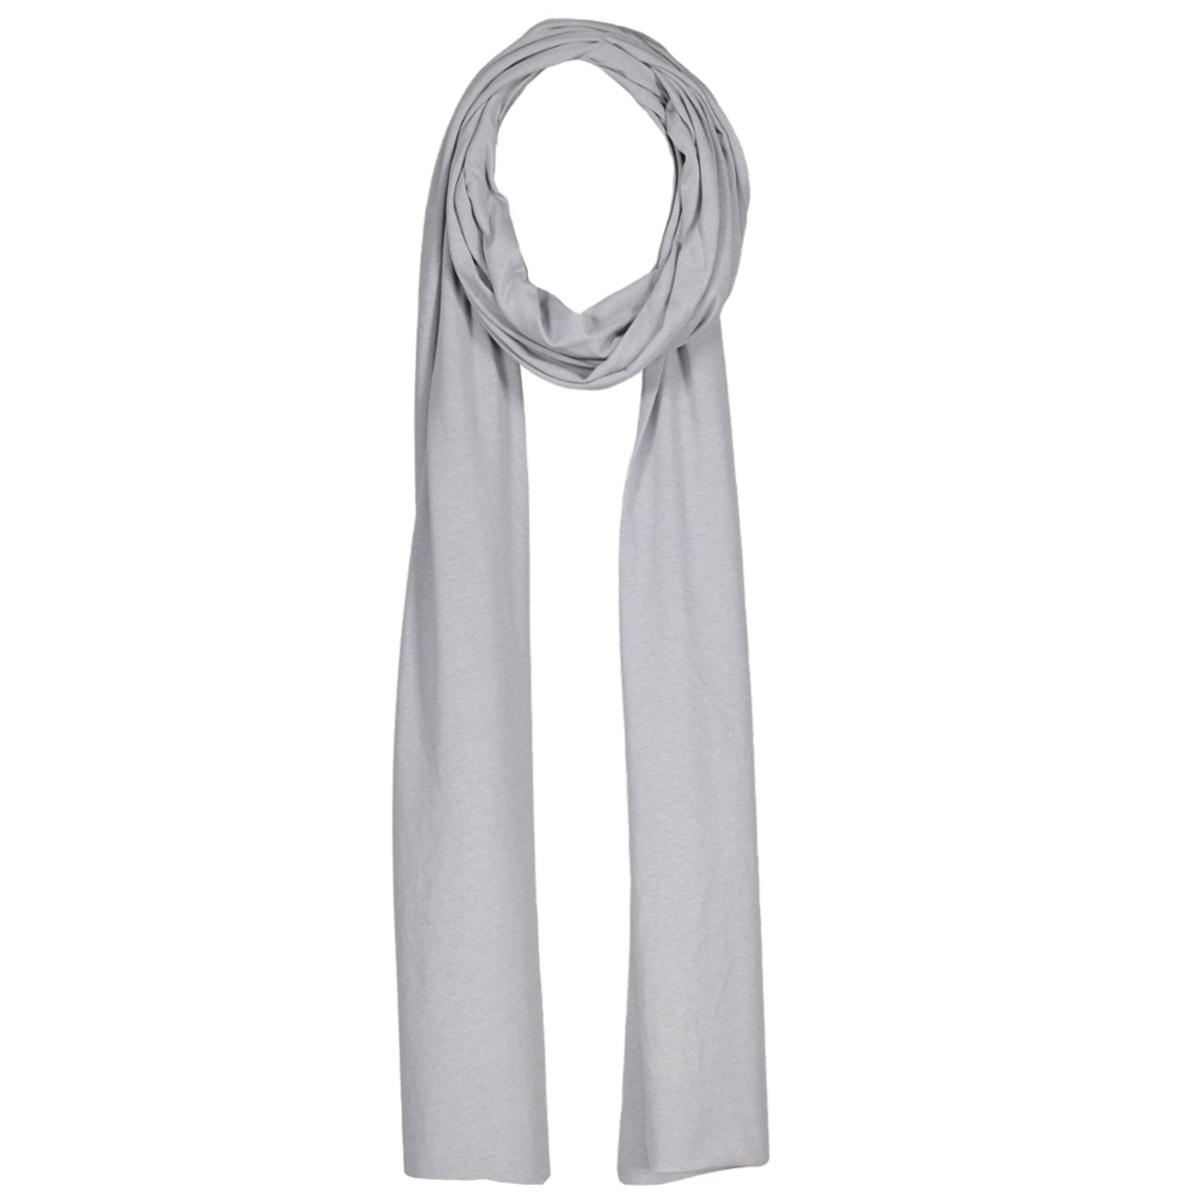 732 blue pepper sjaal grey